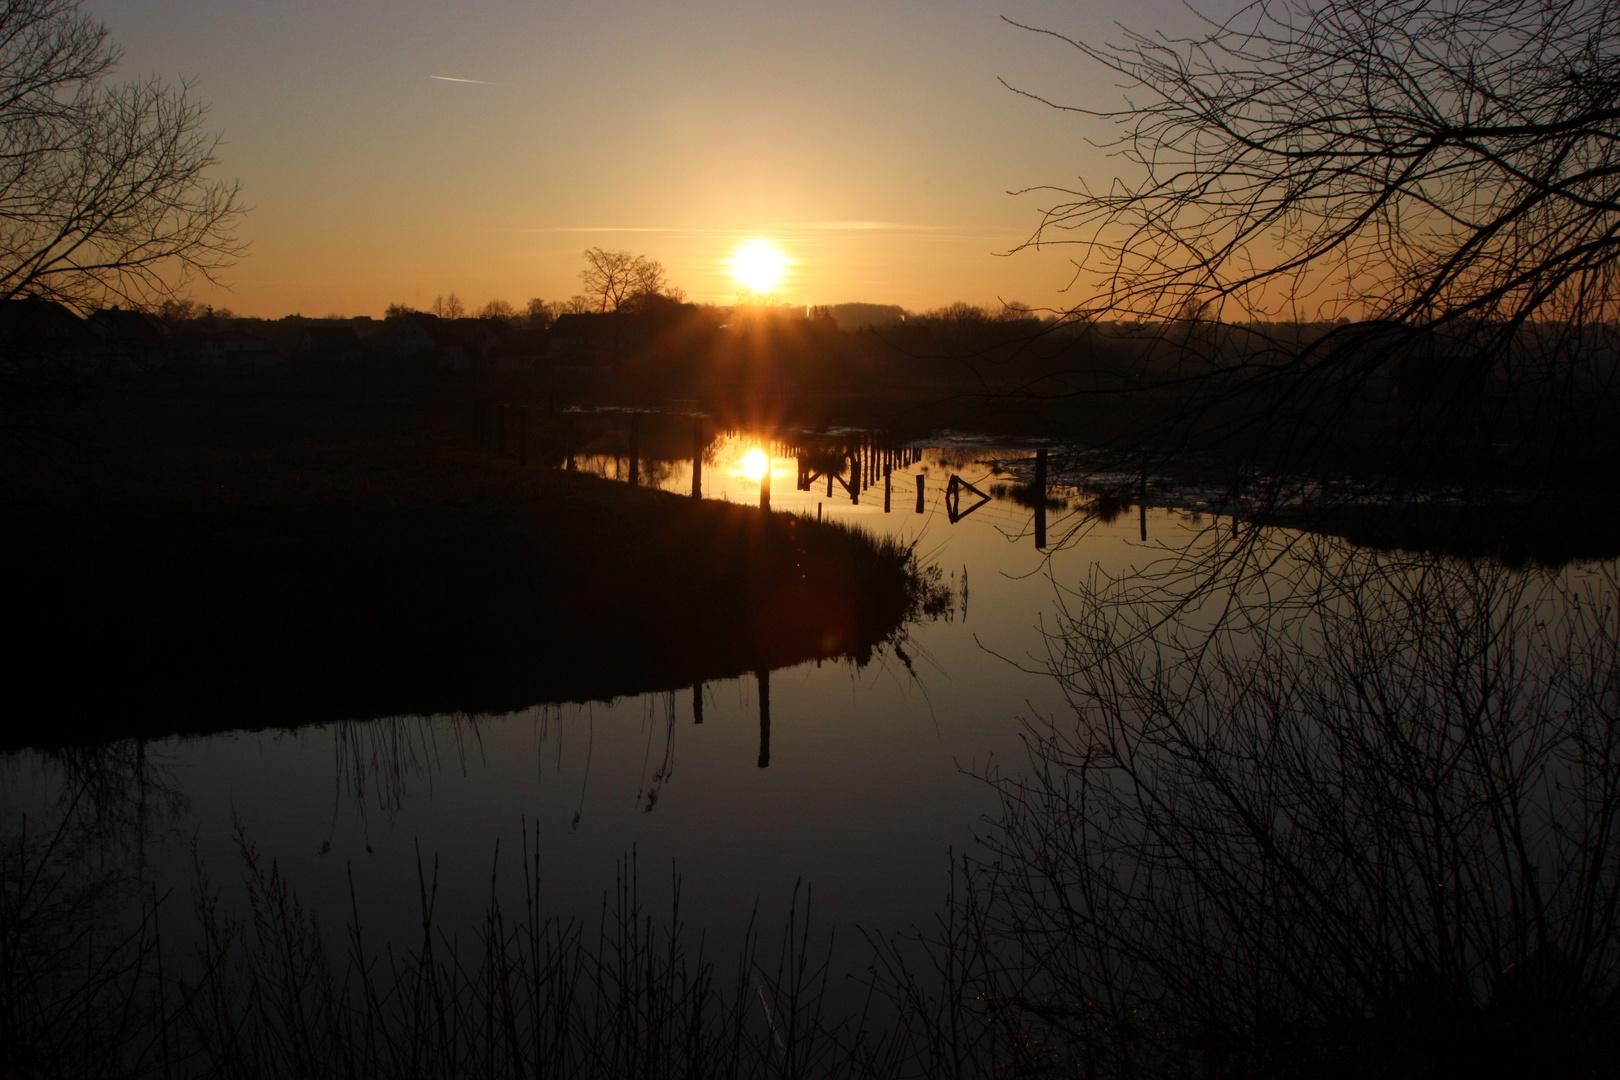 Sonnenuntergang in Kirchlengern